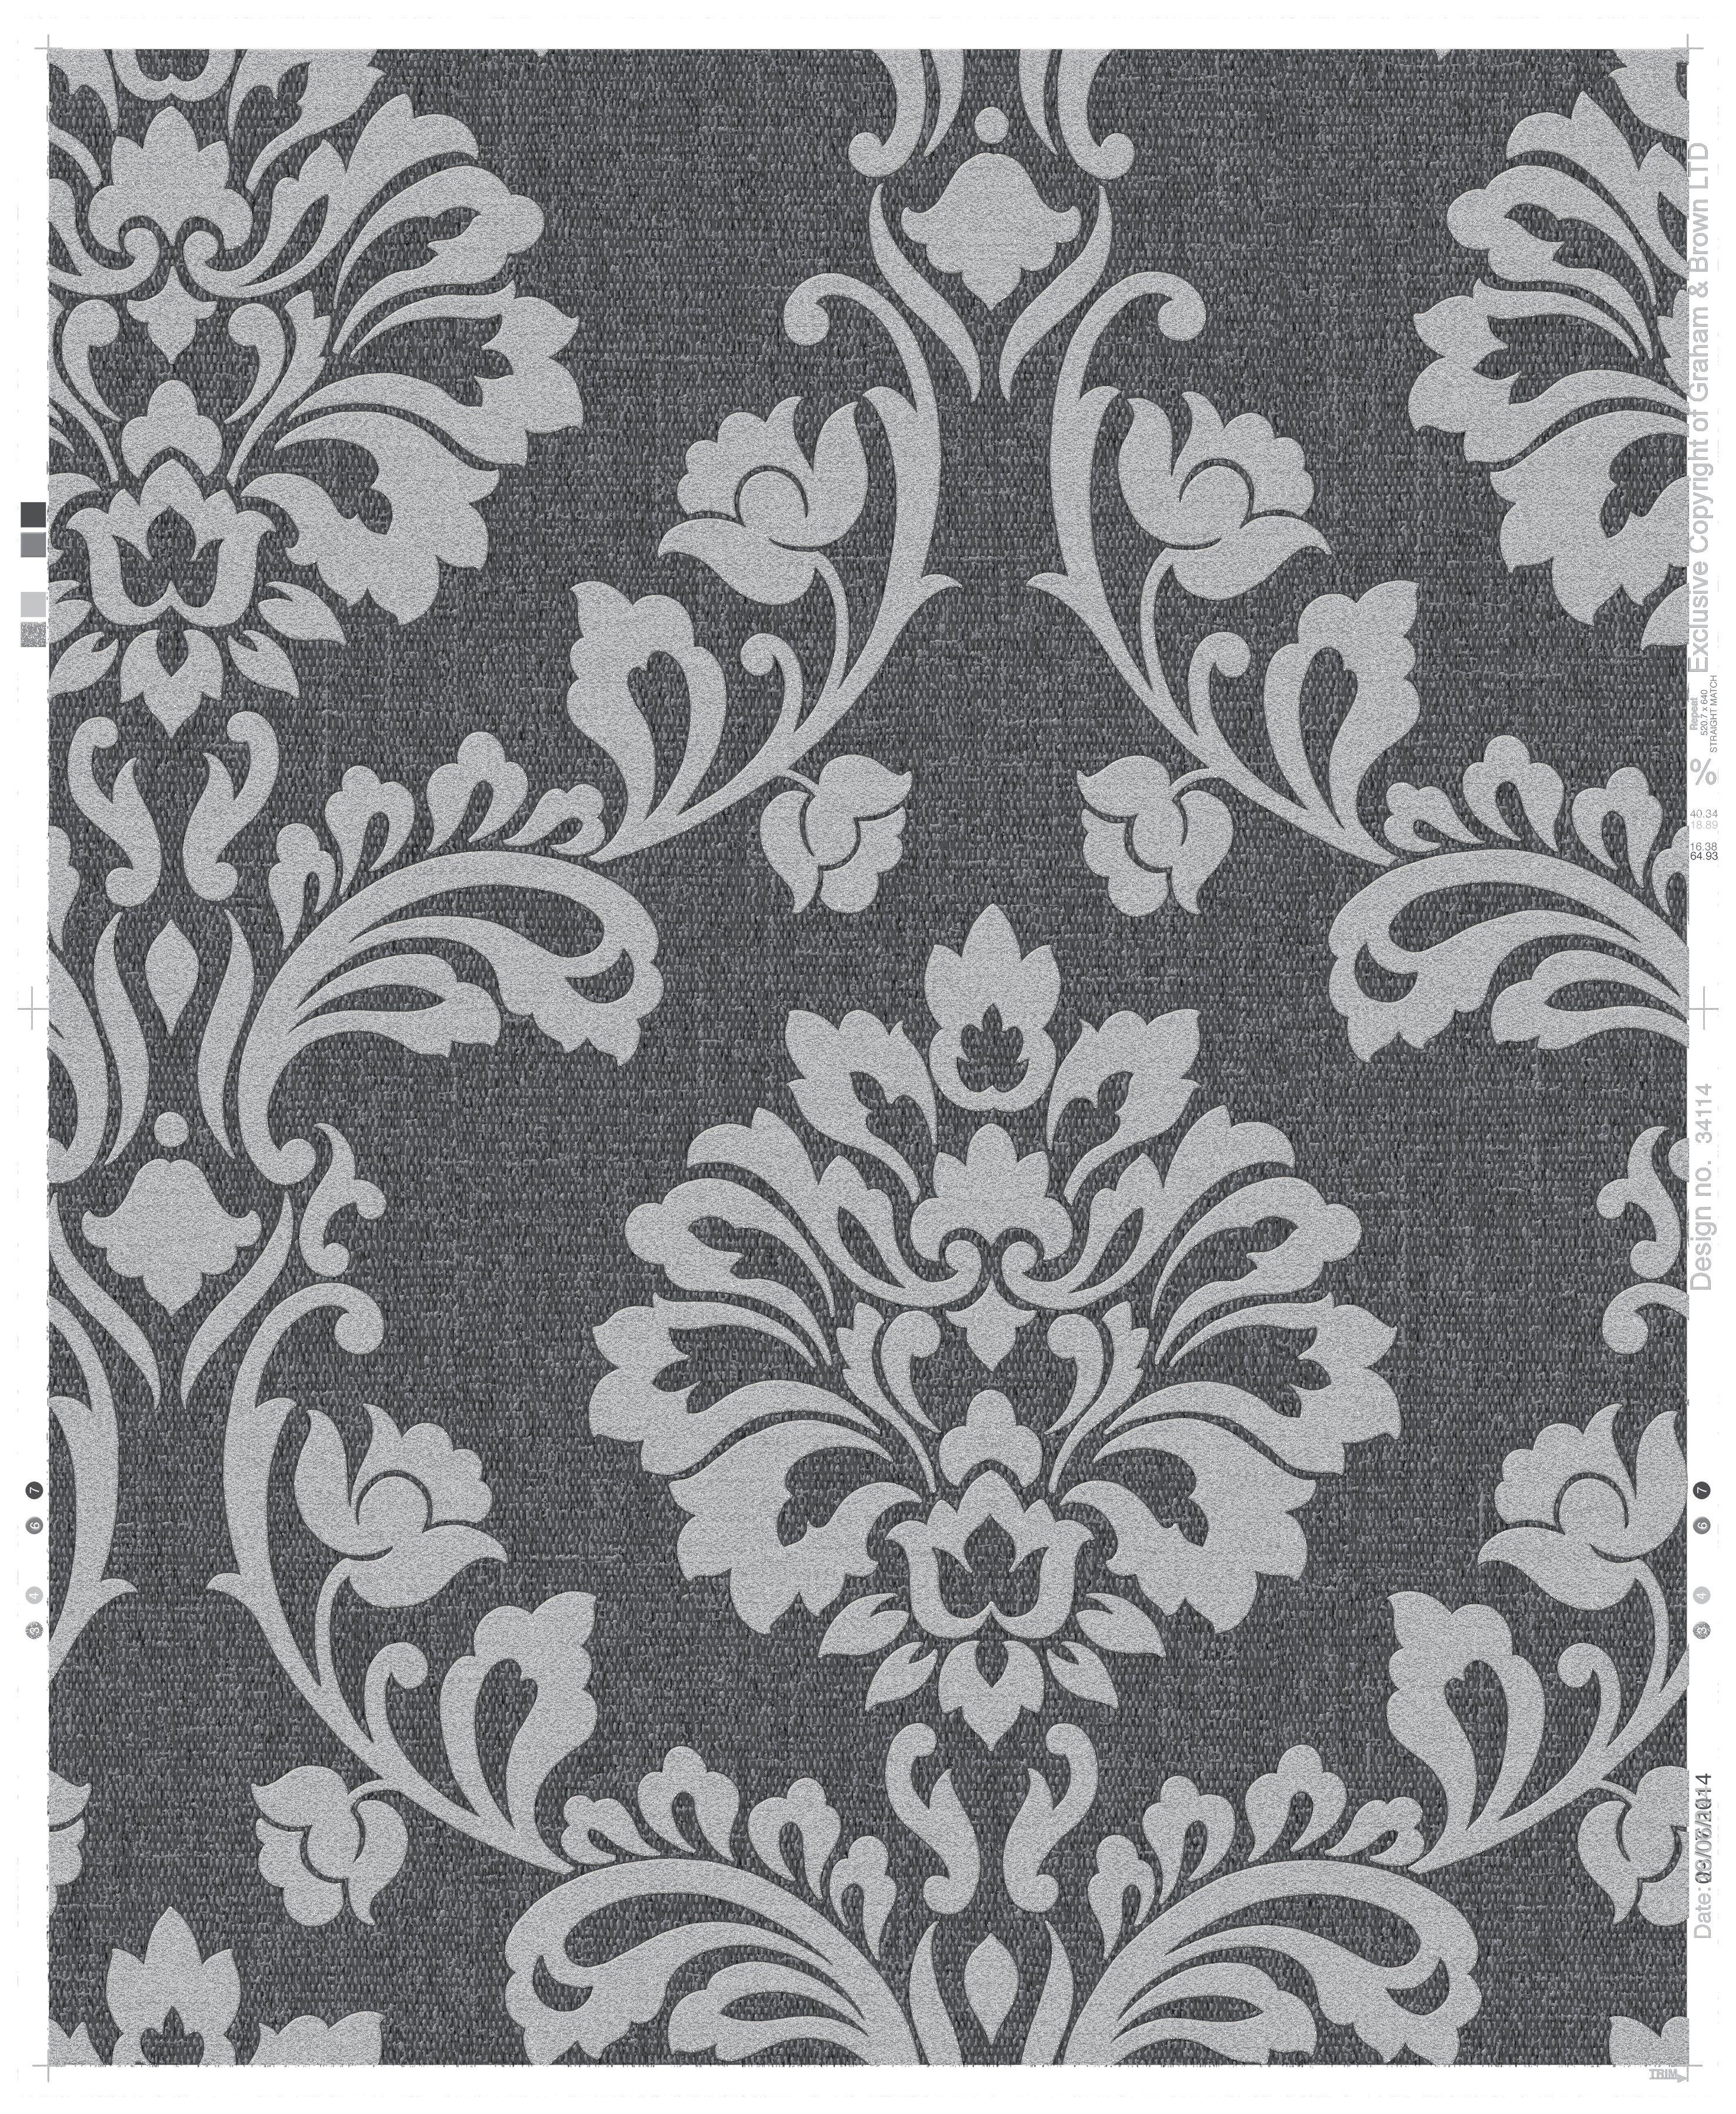 Superfresco Colours Aurora Wallpaper - Black and Grey.